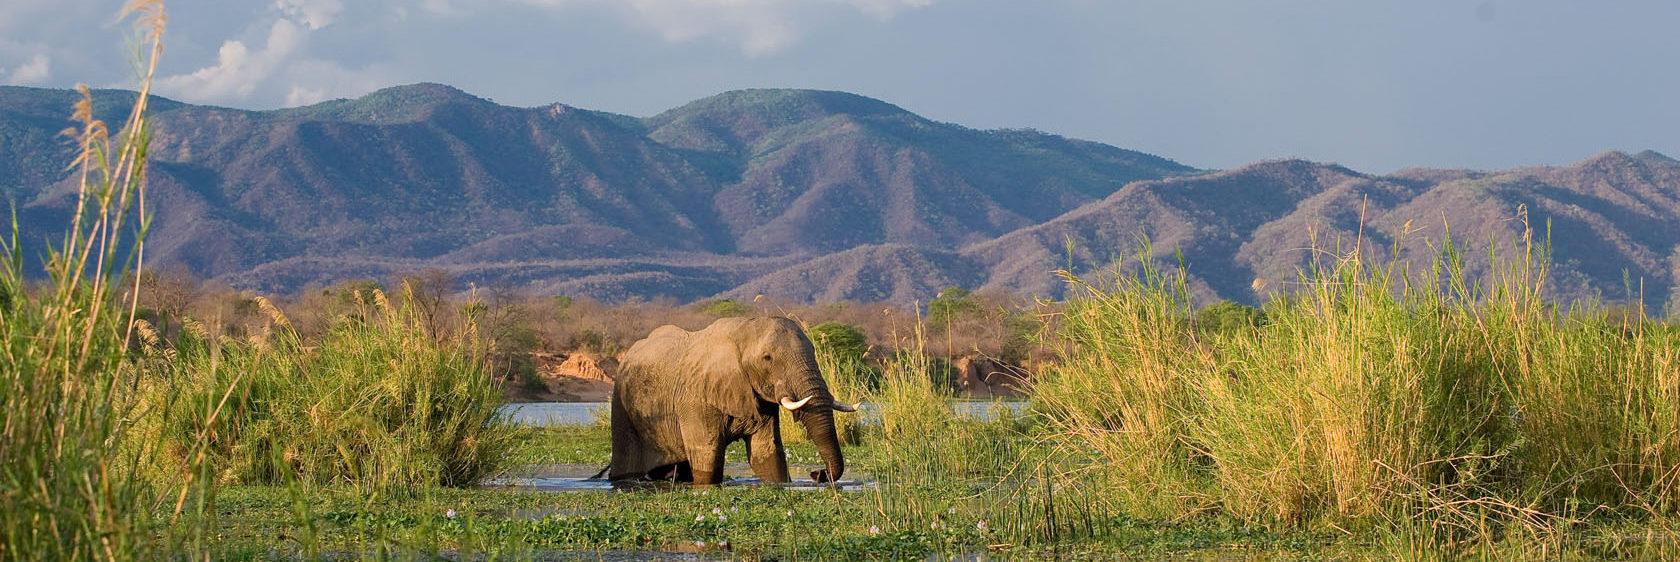 Africa's savannah to sea